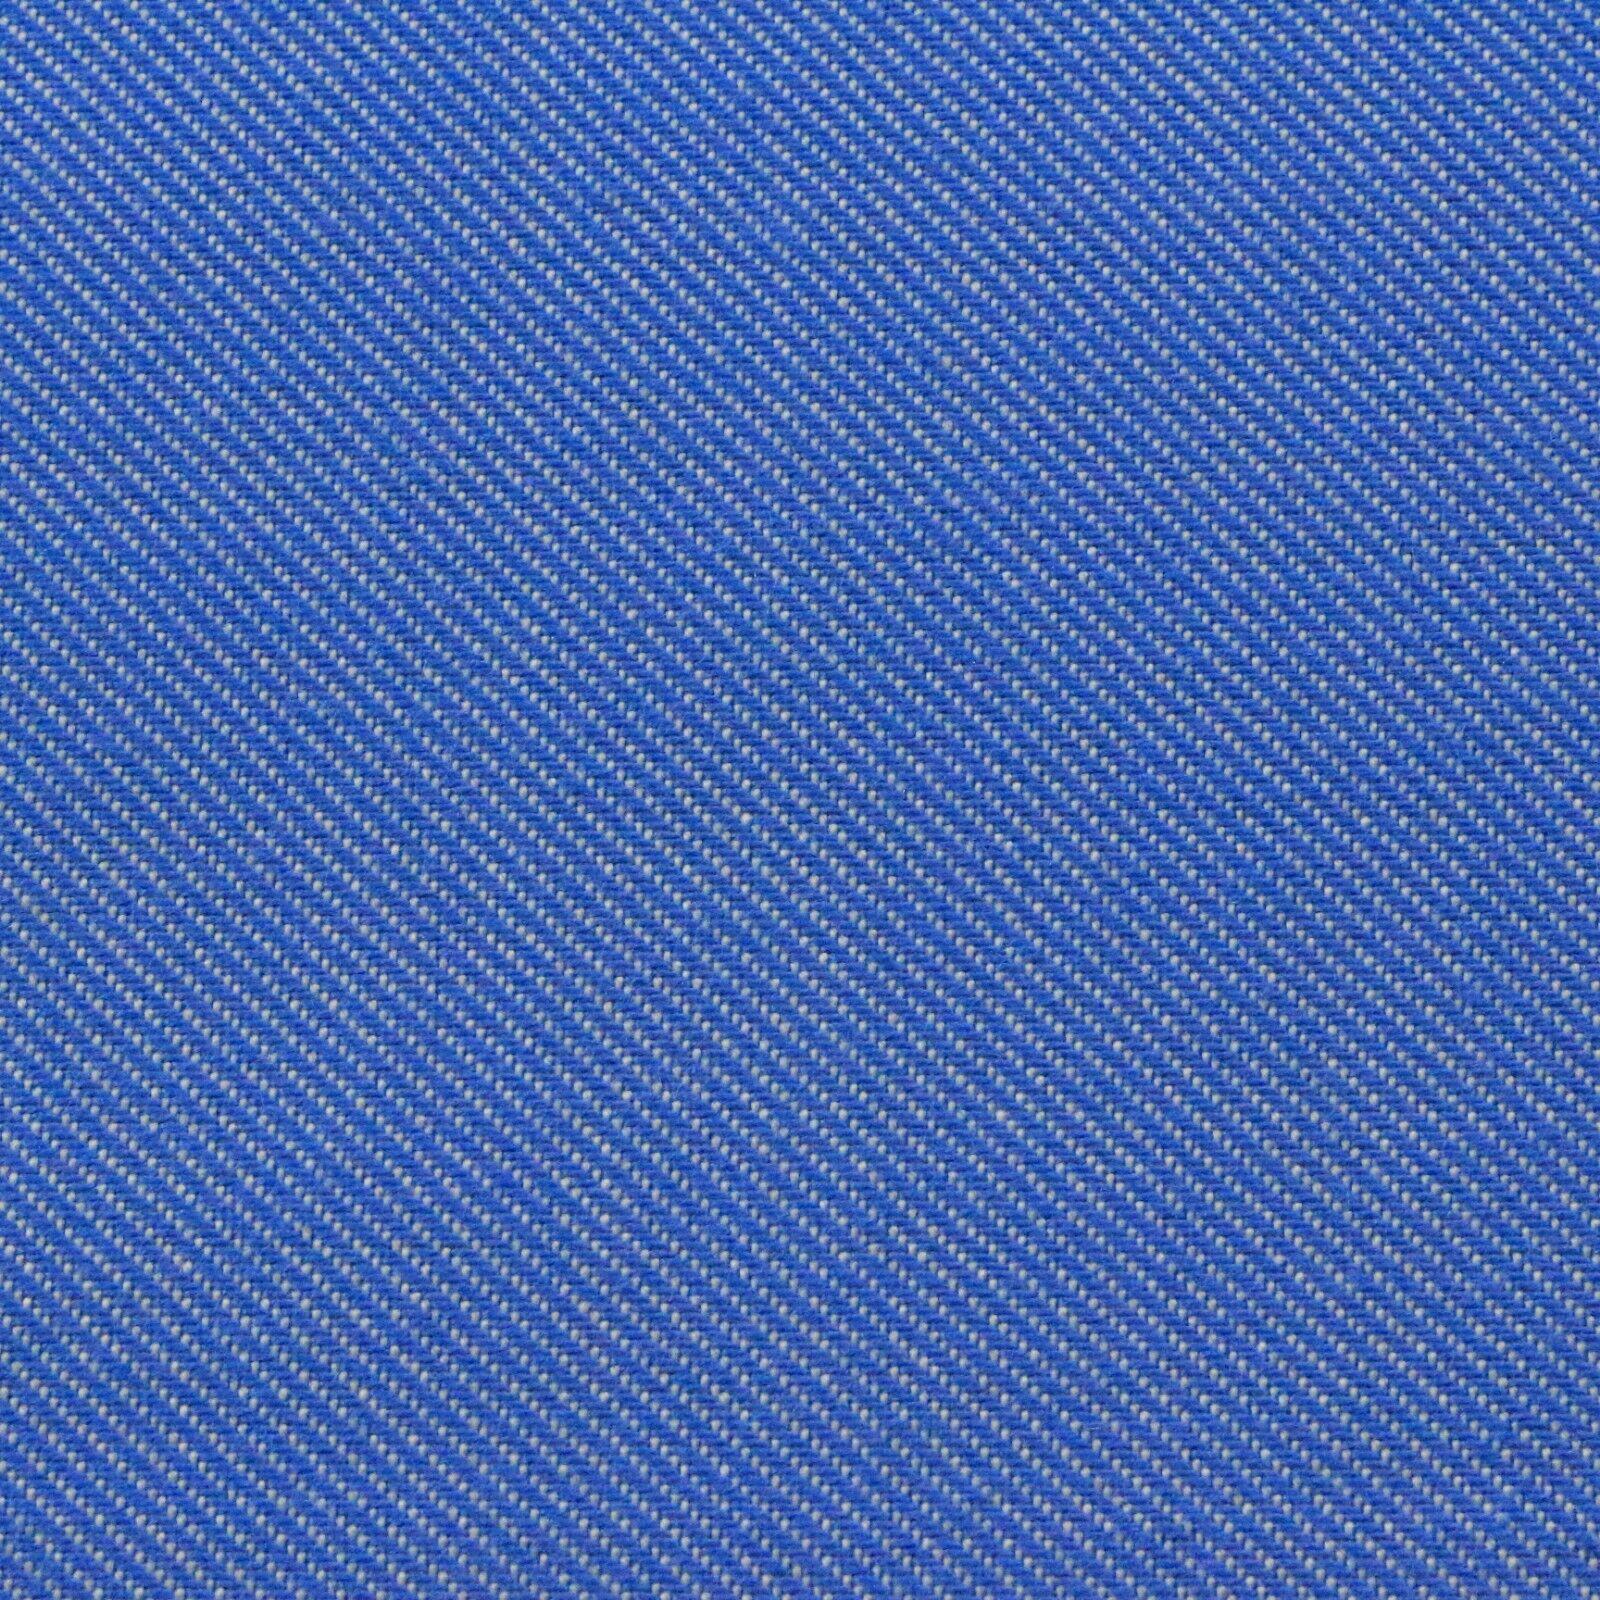 SUNBRELLA FLAGSHIP CAPRI BLUE WOVEN TWILL OUTDOOR INDOOR FAB